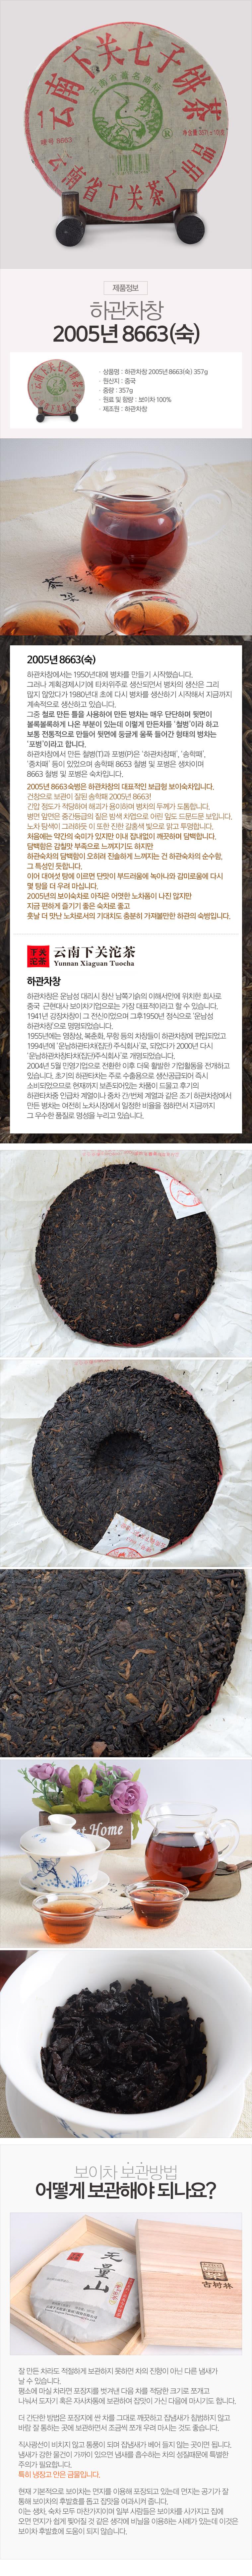 [ BuyongCo ] 下关茶厂,普洱茶 2005年 8663(熟) 357g